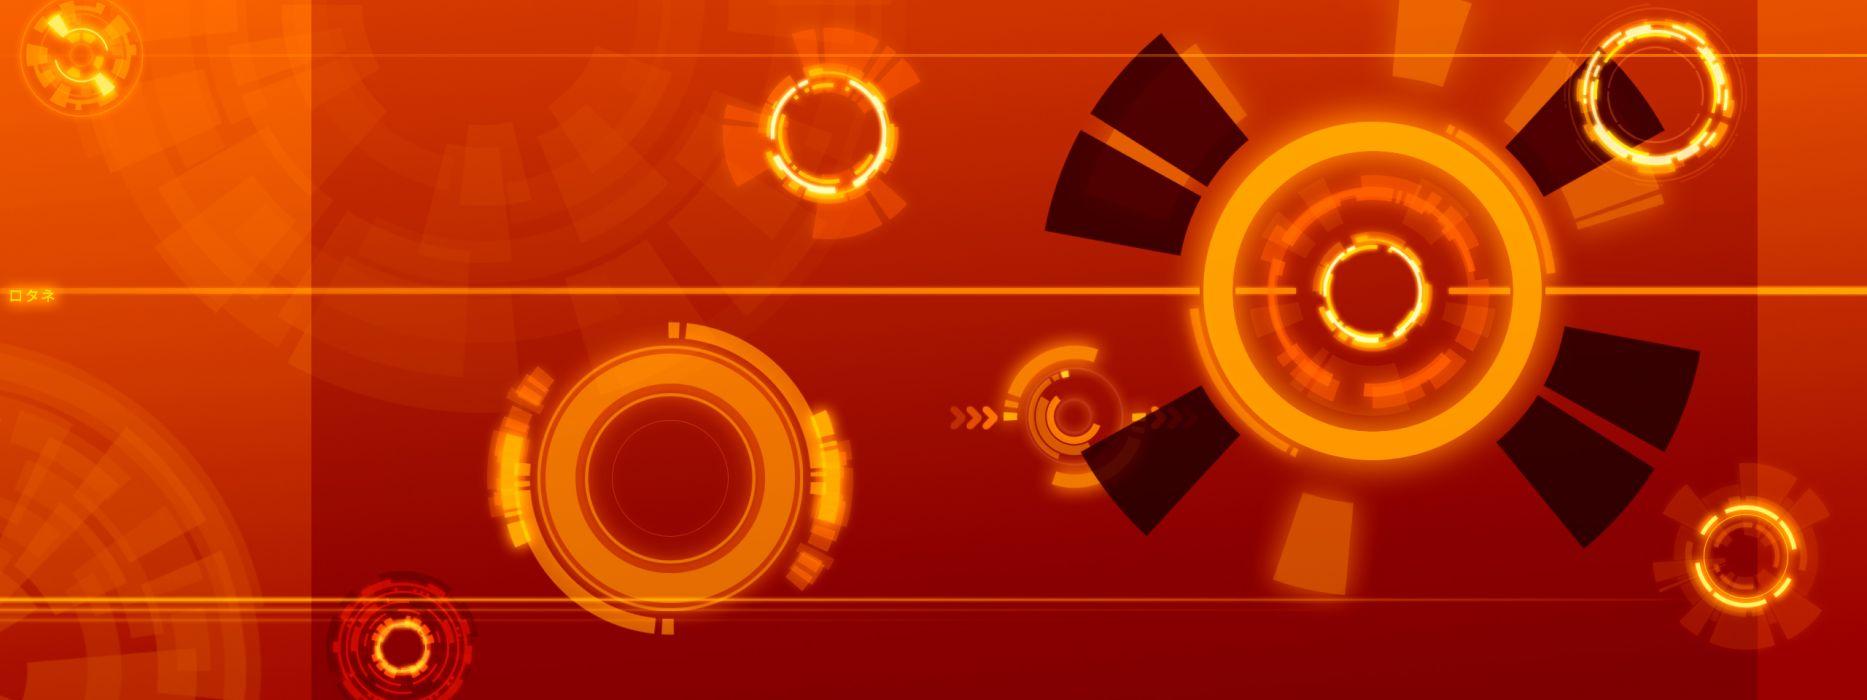 abstract orange digital art wallpaper